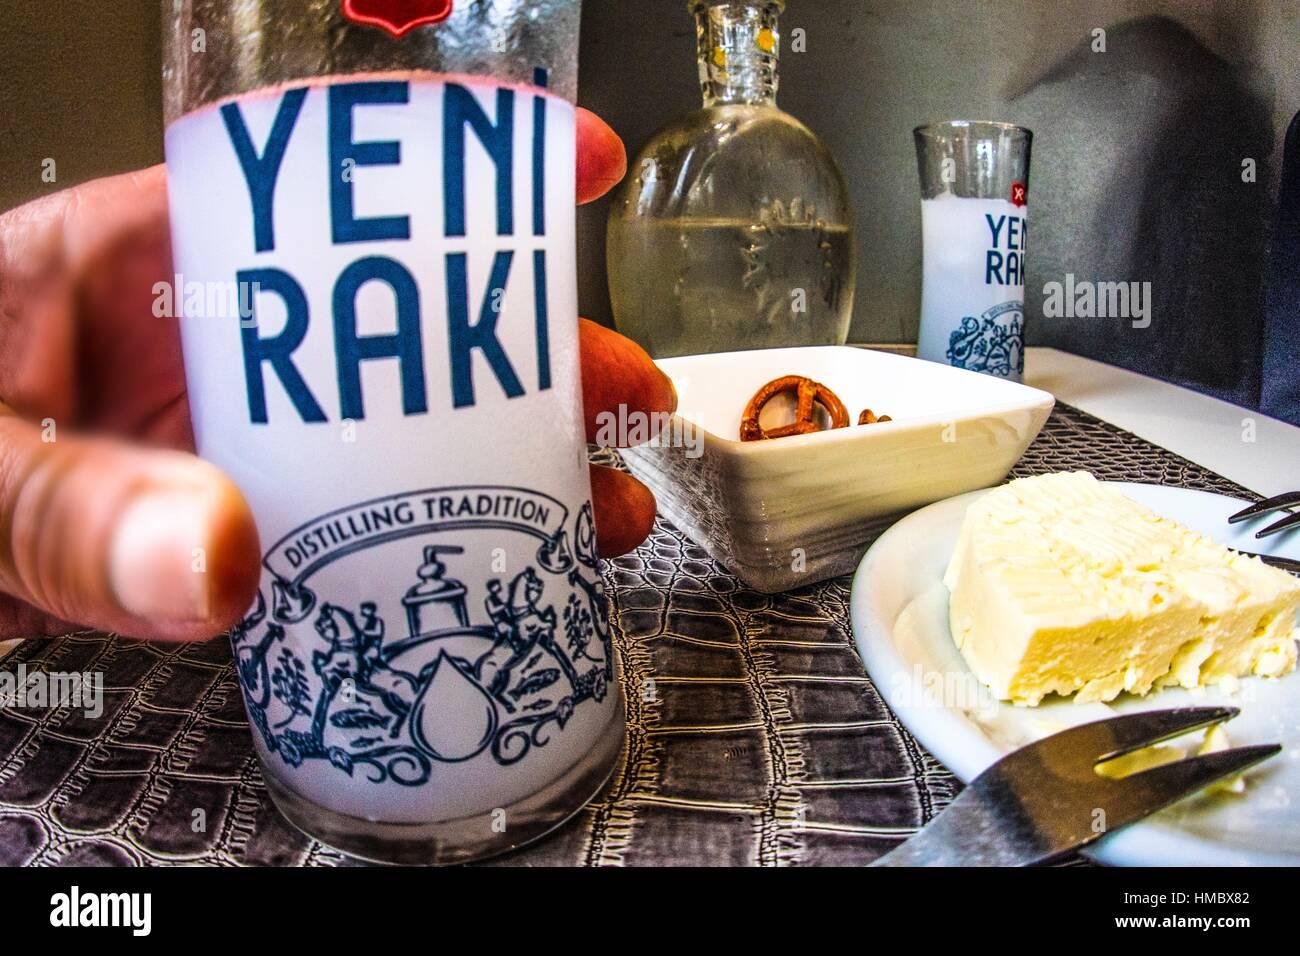 Raki, anise-flavored alcoholic drink, Turkey - Stock Image